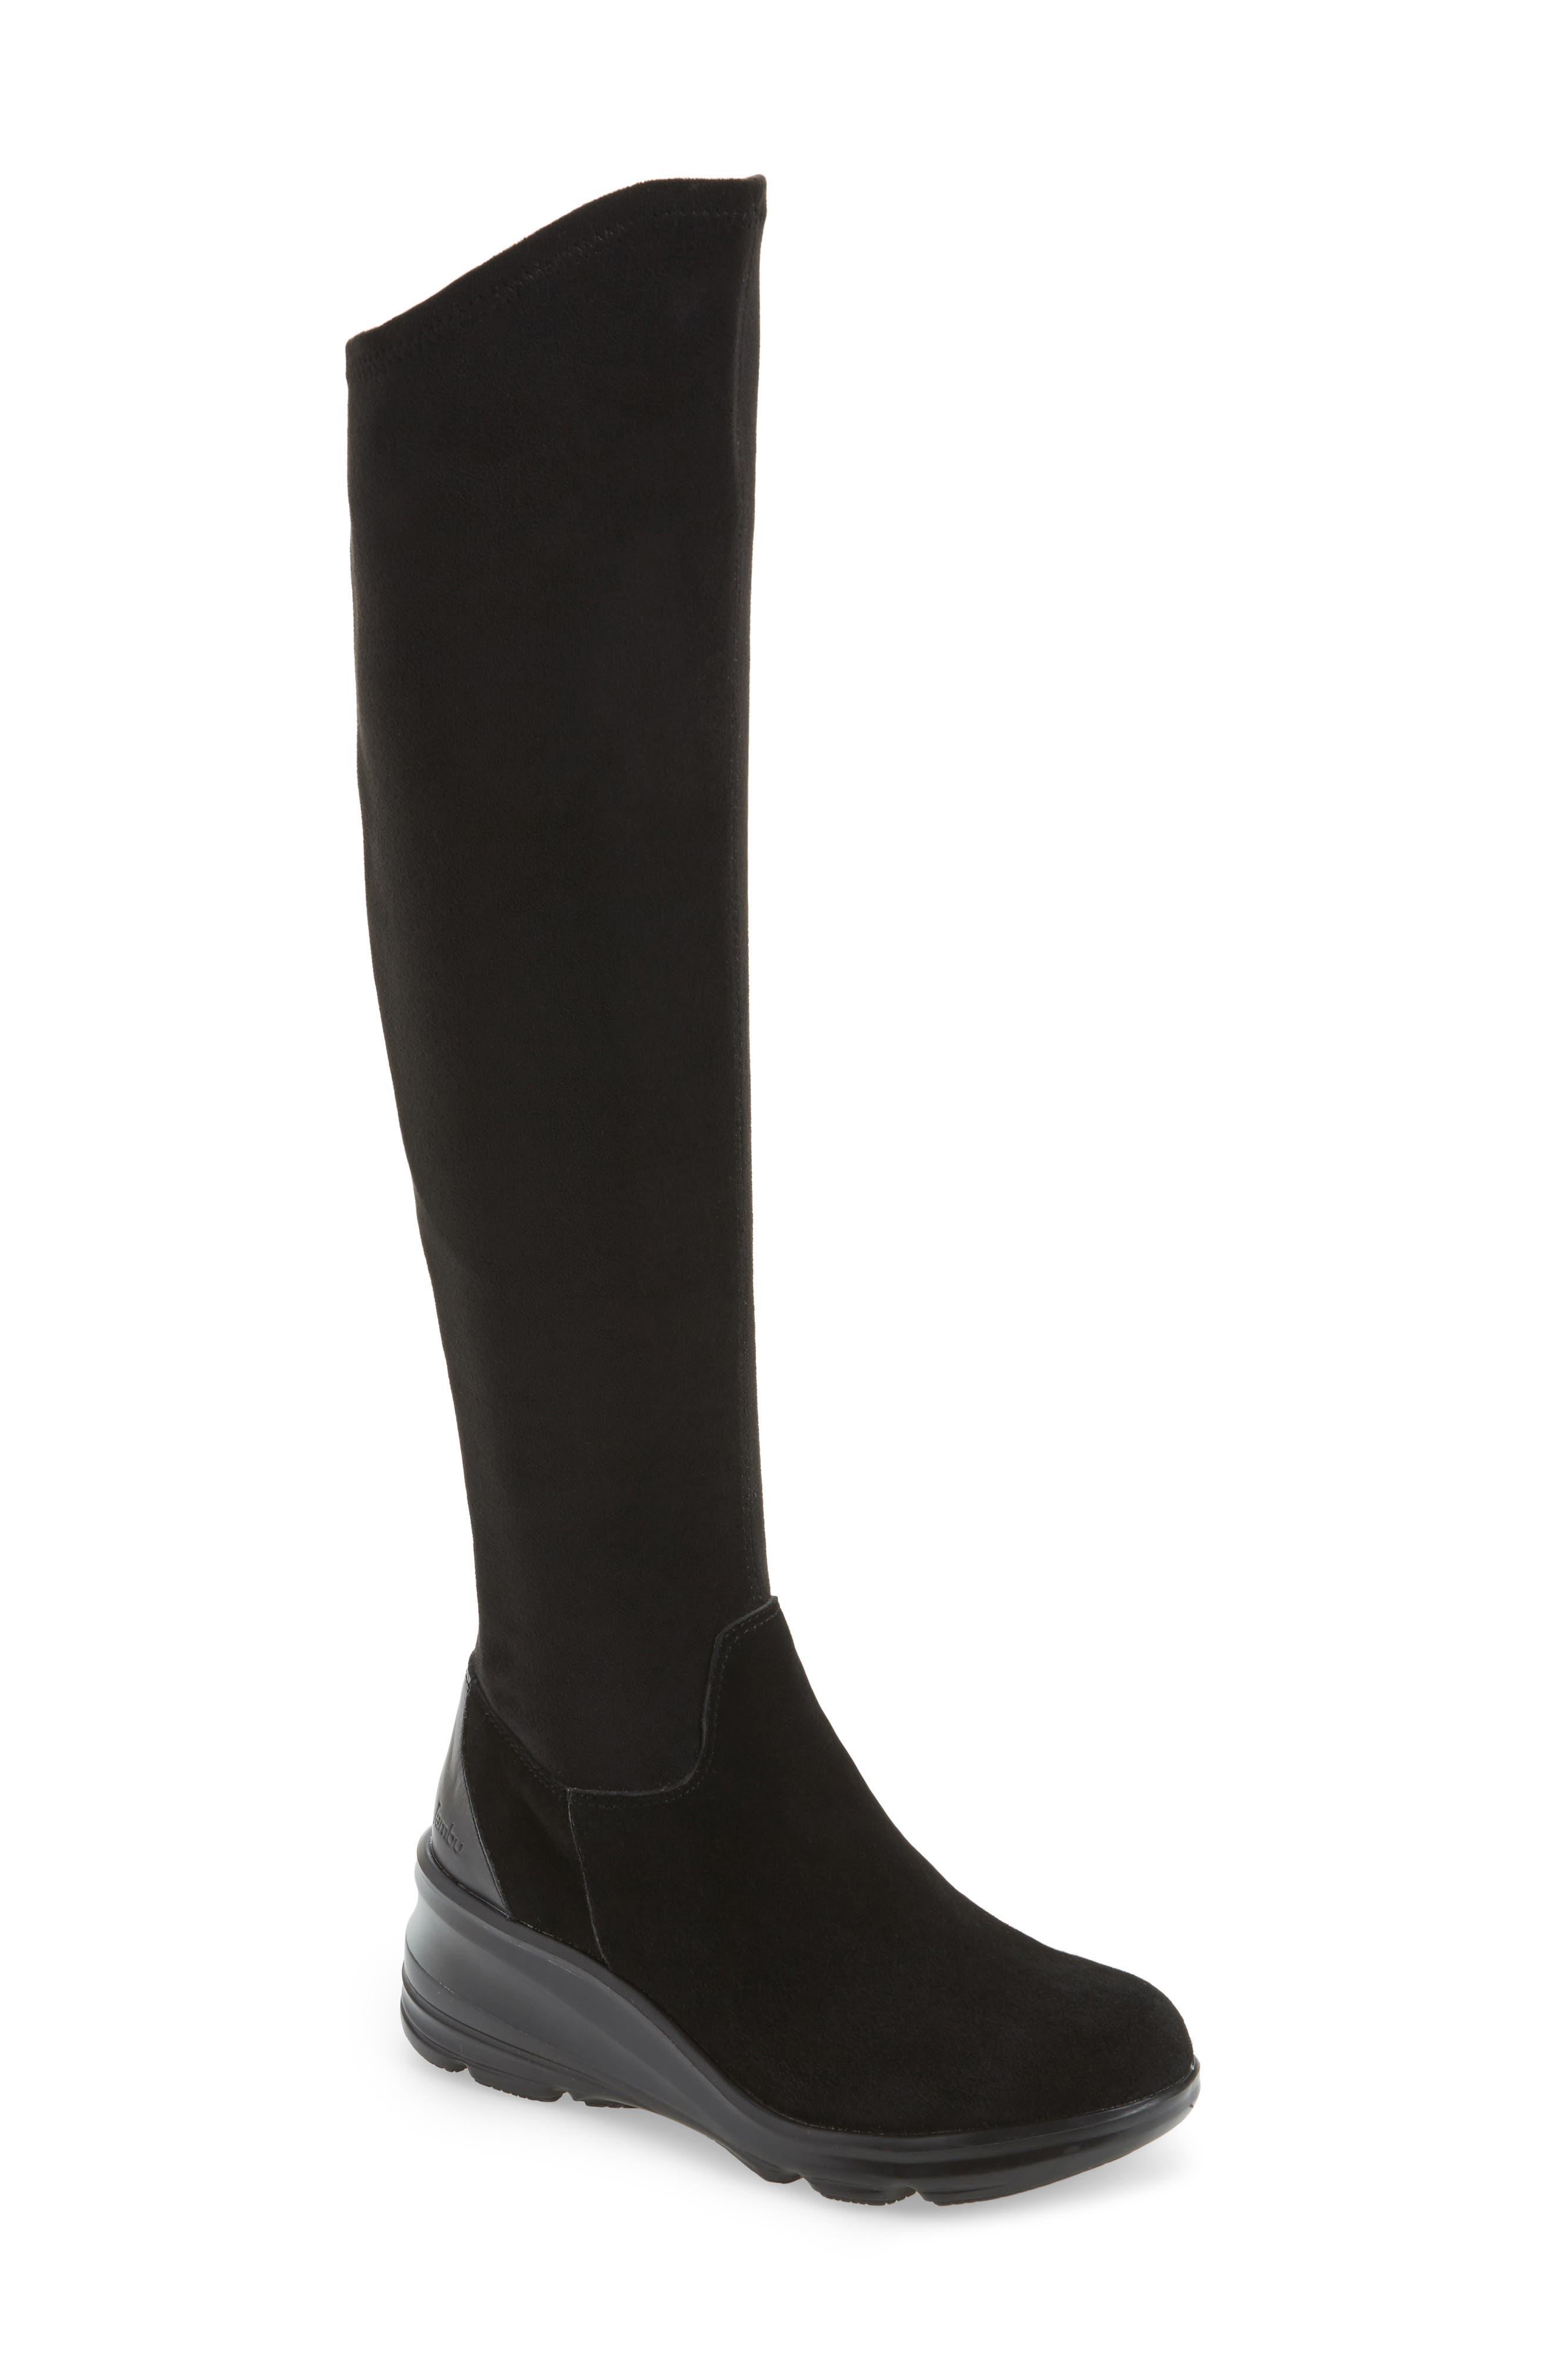 Main Image - Jambu Kendra Over the Knee Water-Resistant Boot (Women)